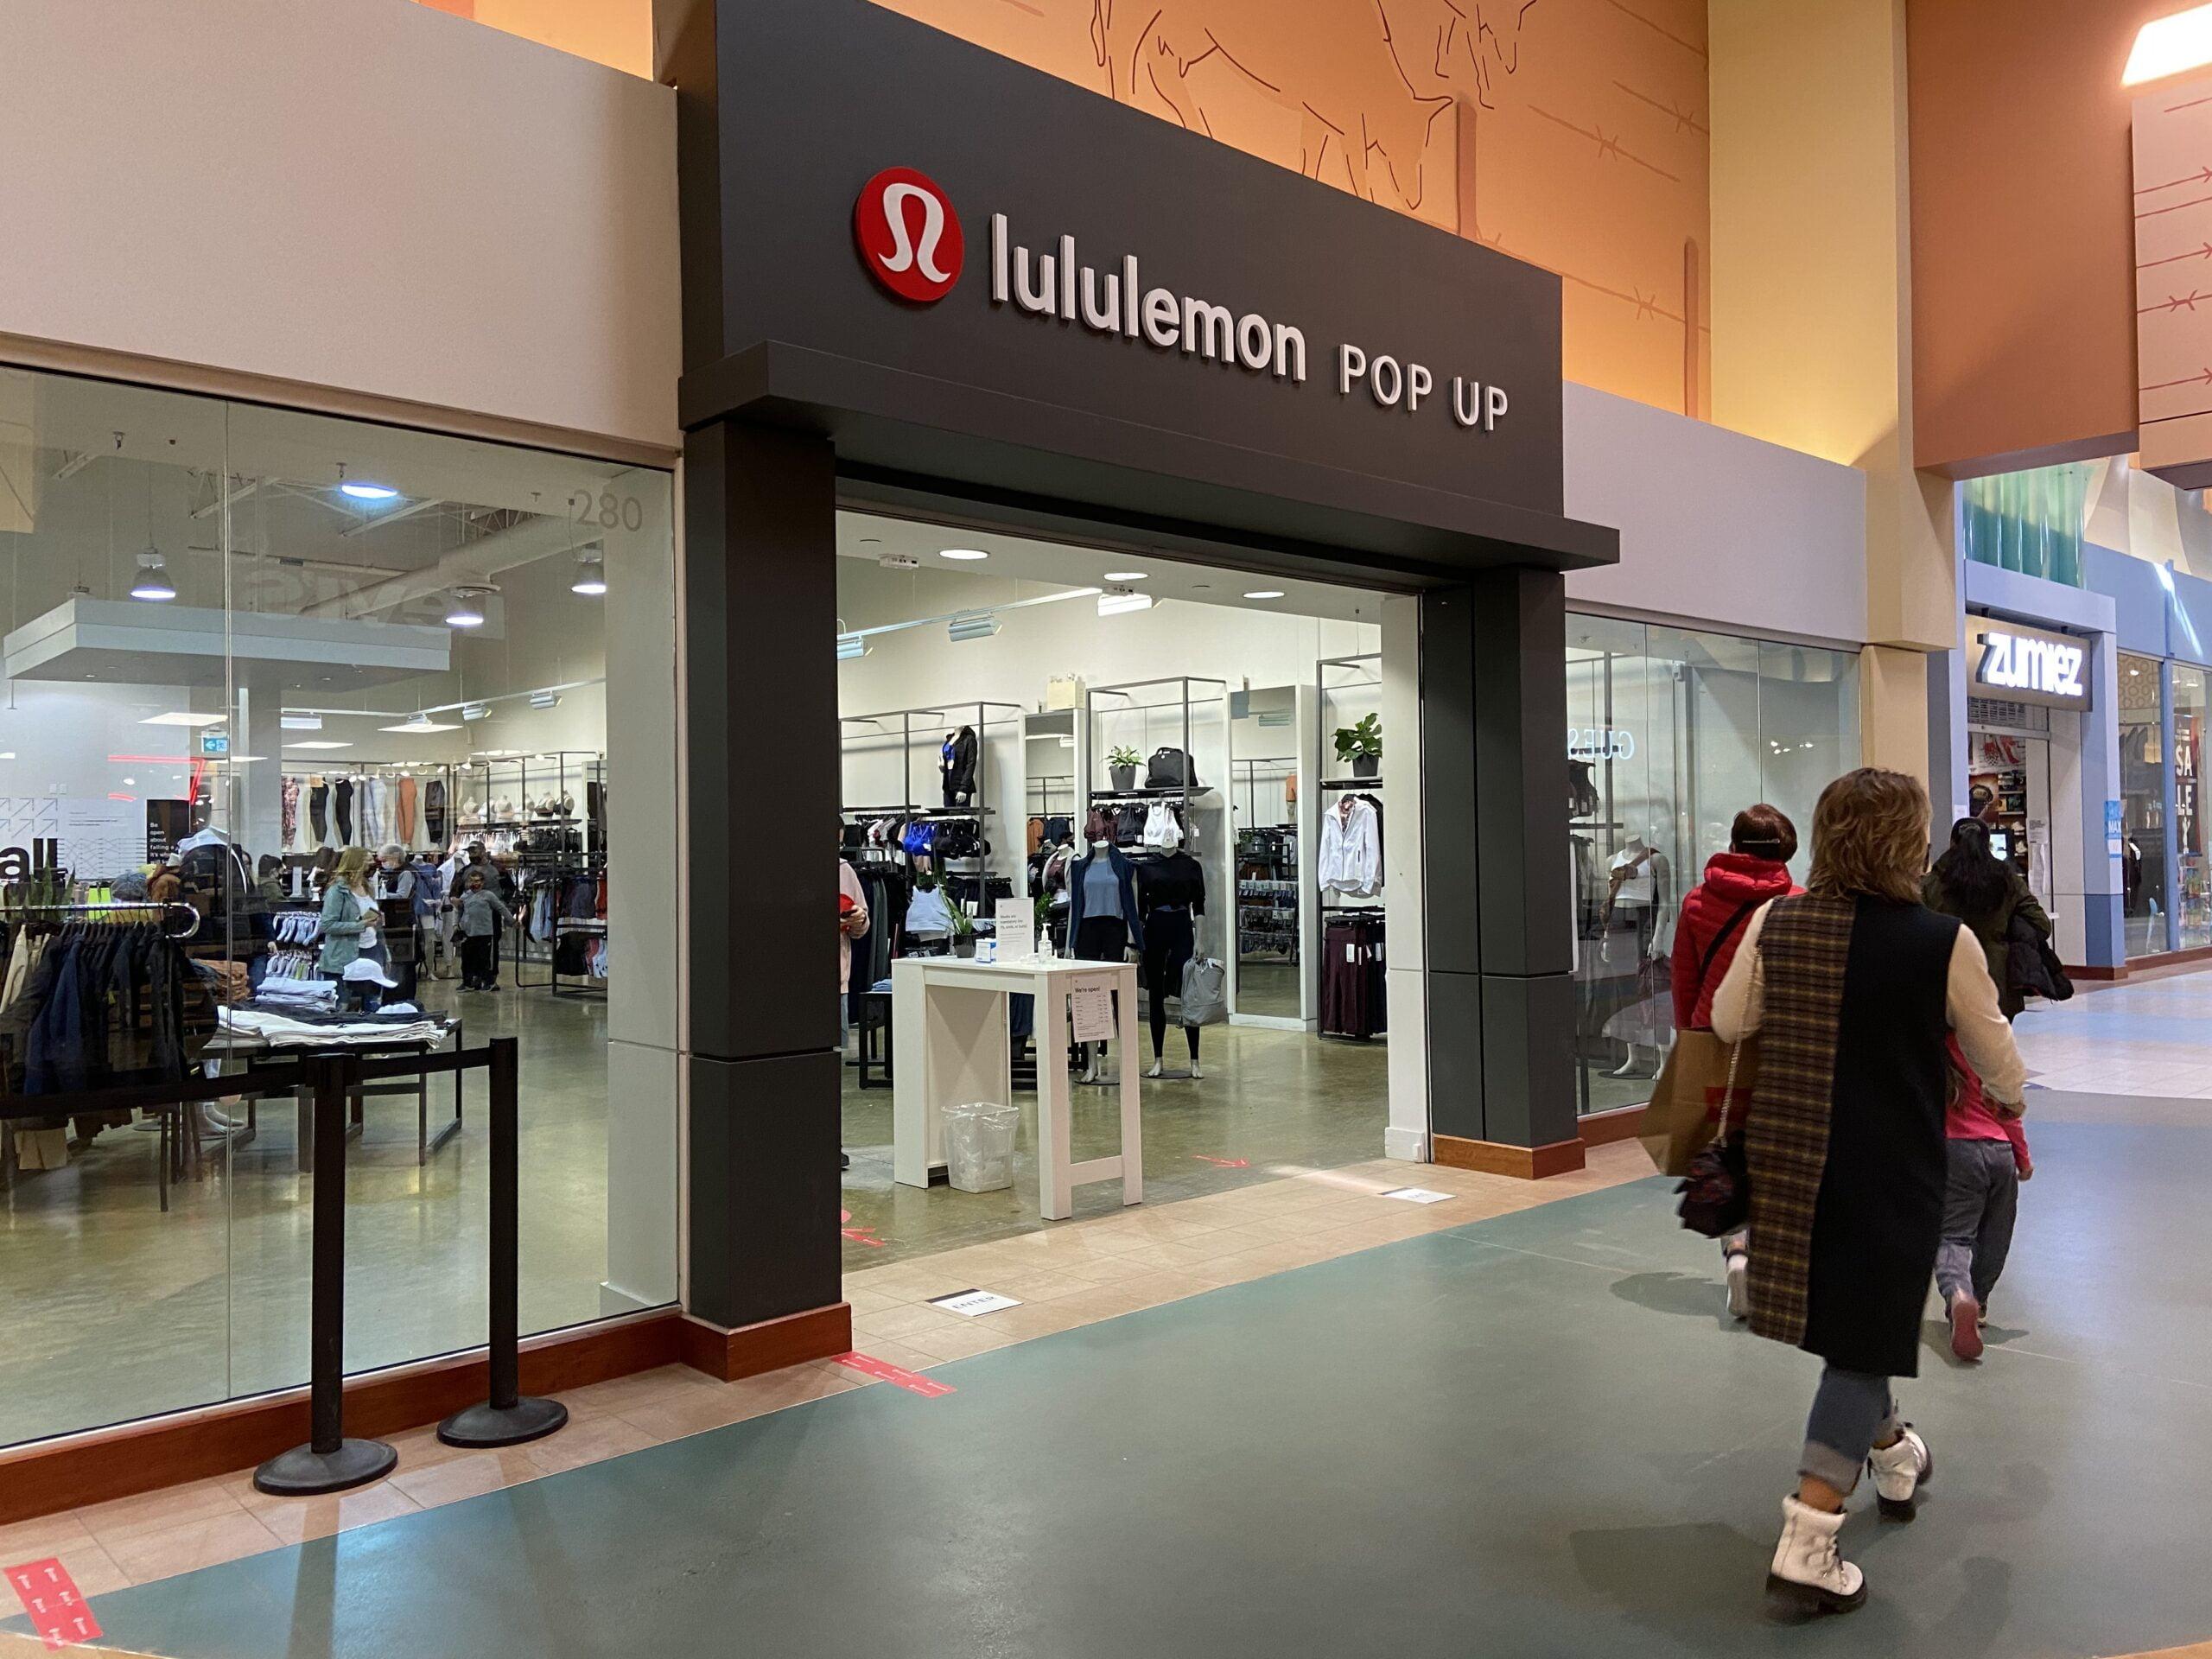 Lululemon Pop Up at CrossIron Mills